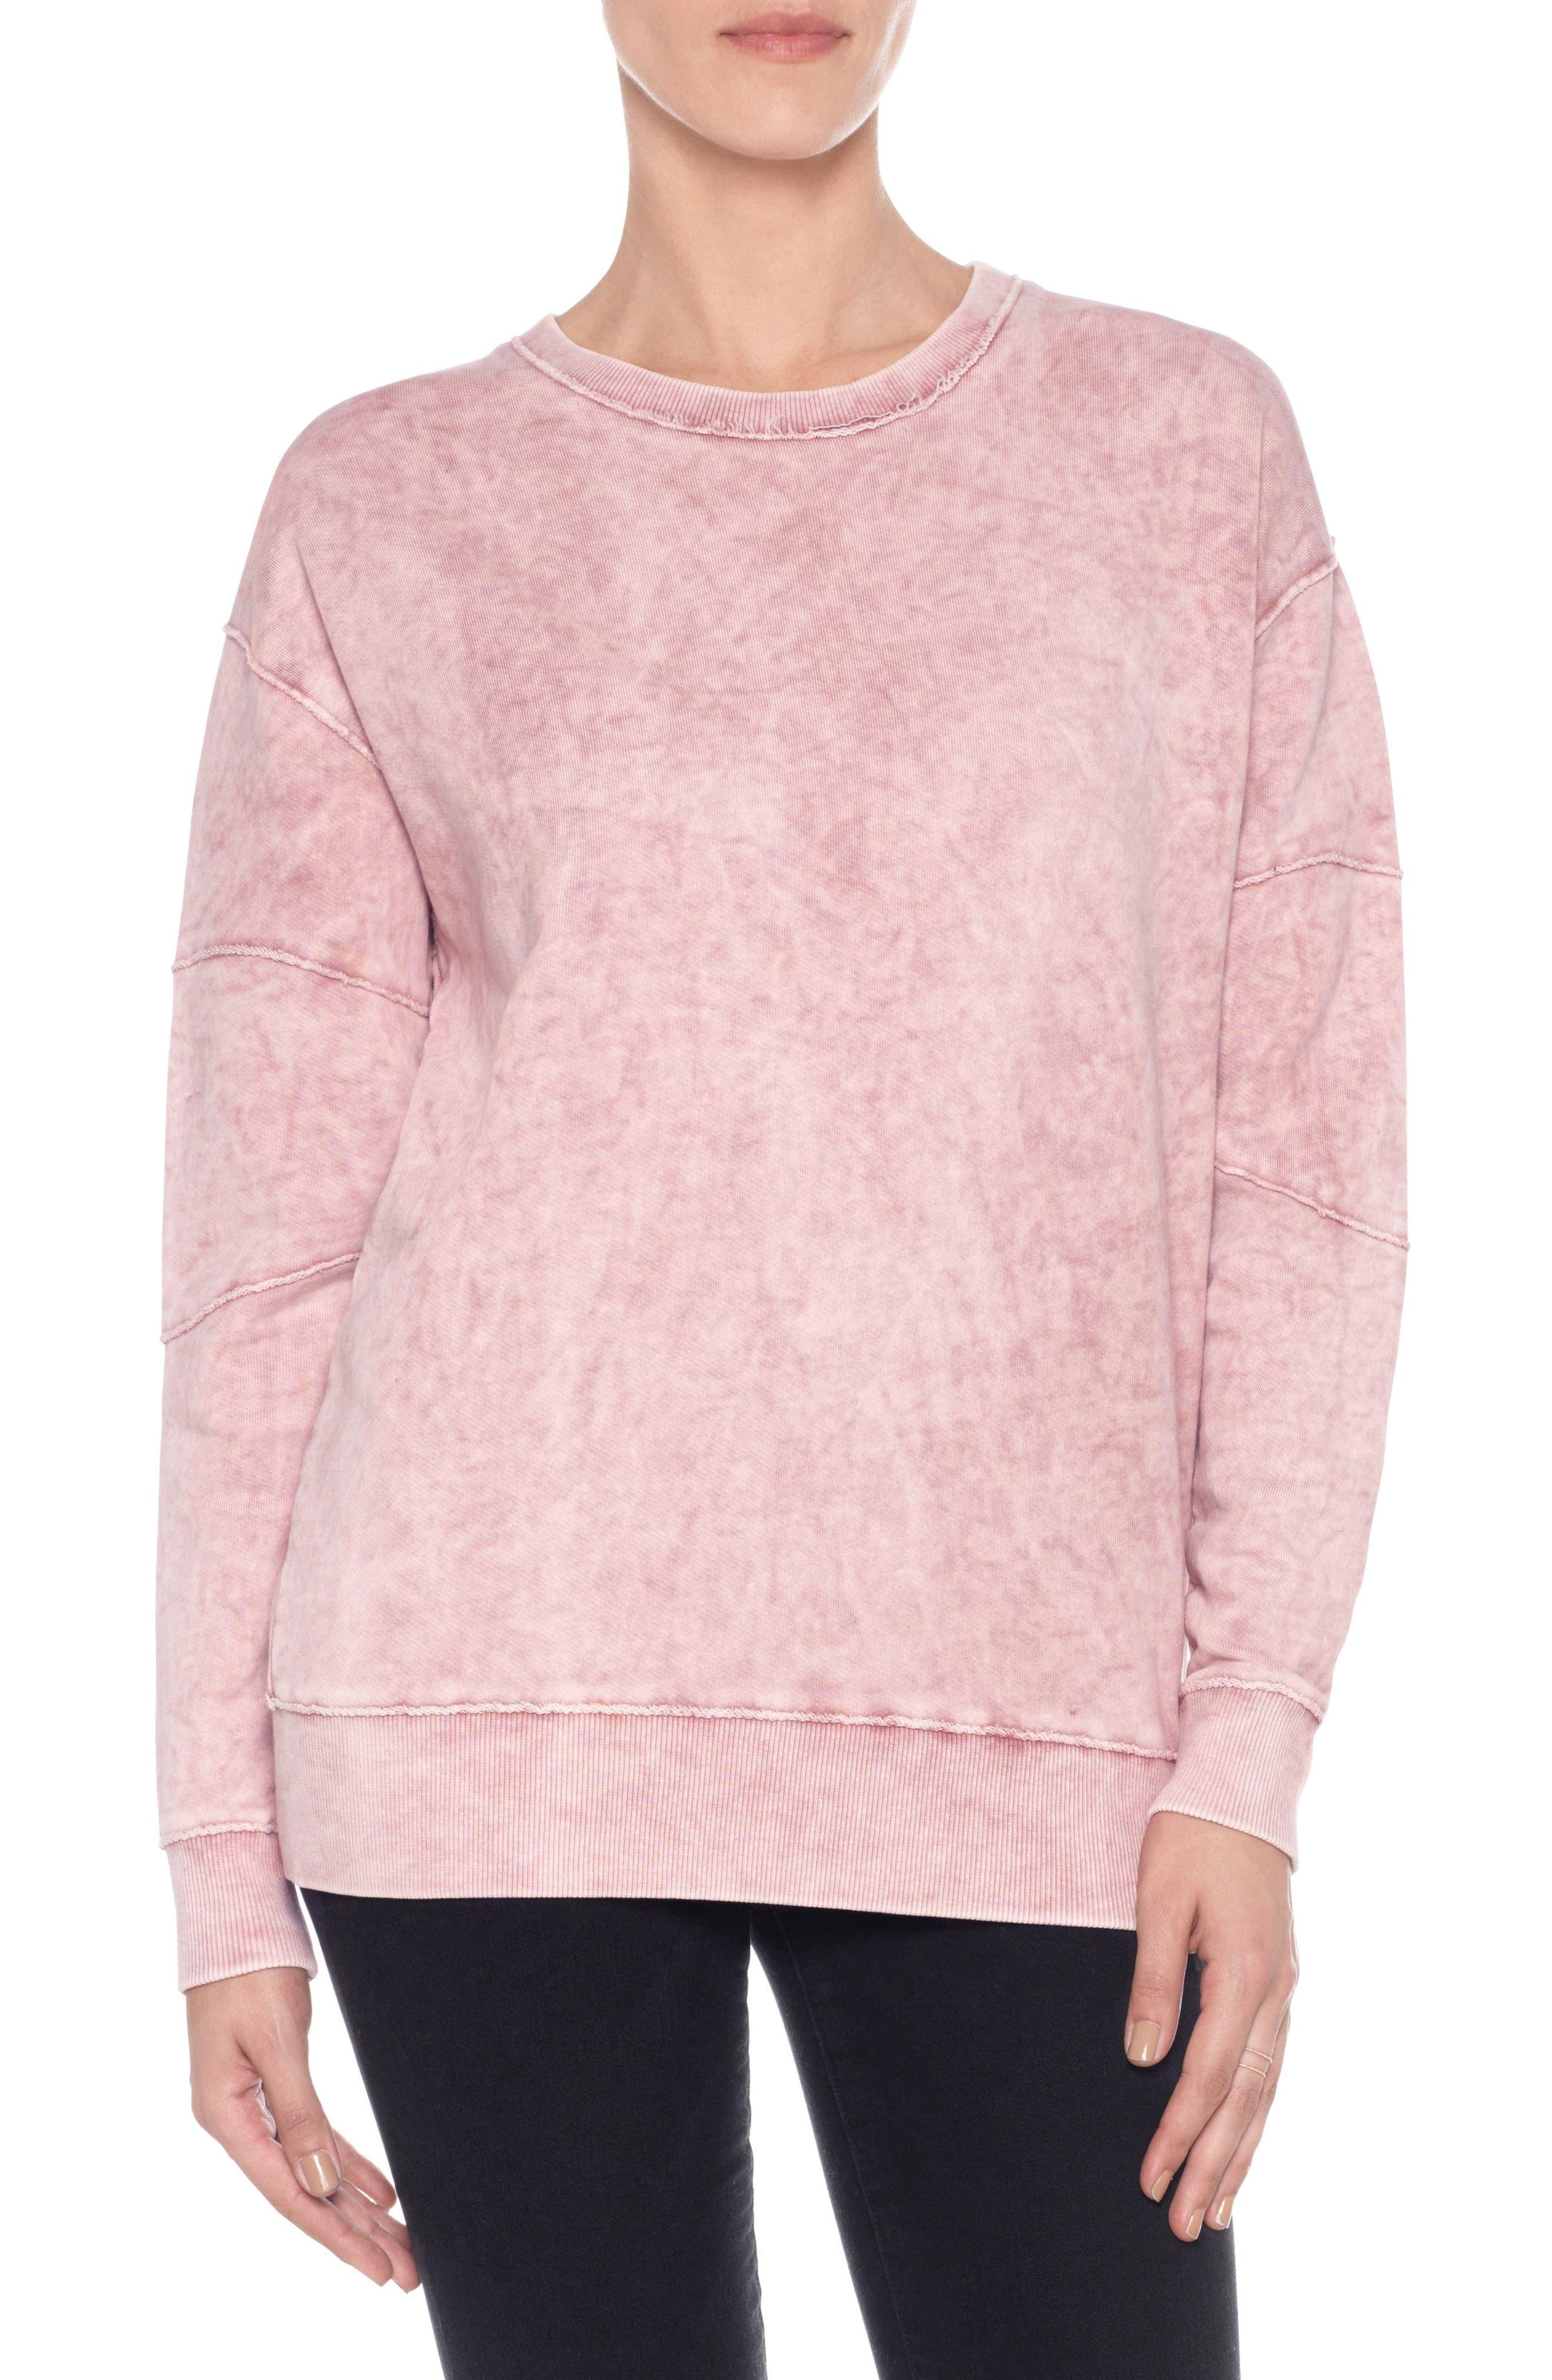 Kendall Sweatshirt,                             Main thumbnail 1, color,                             Wood Rose